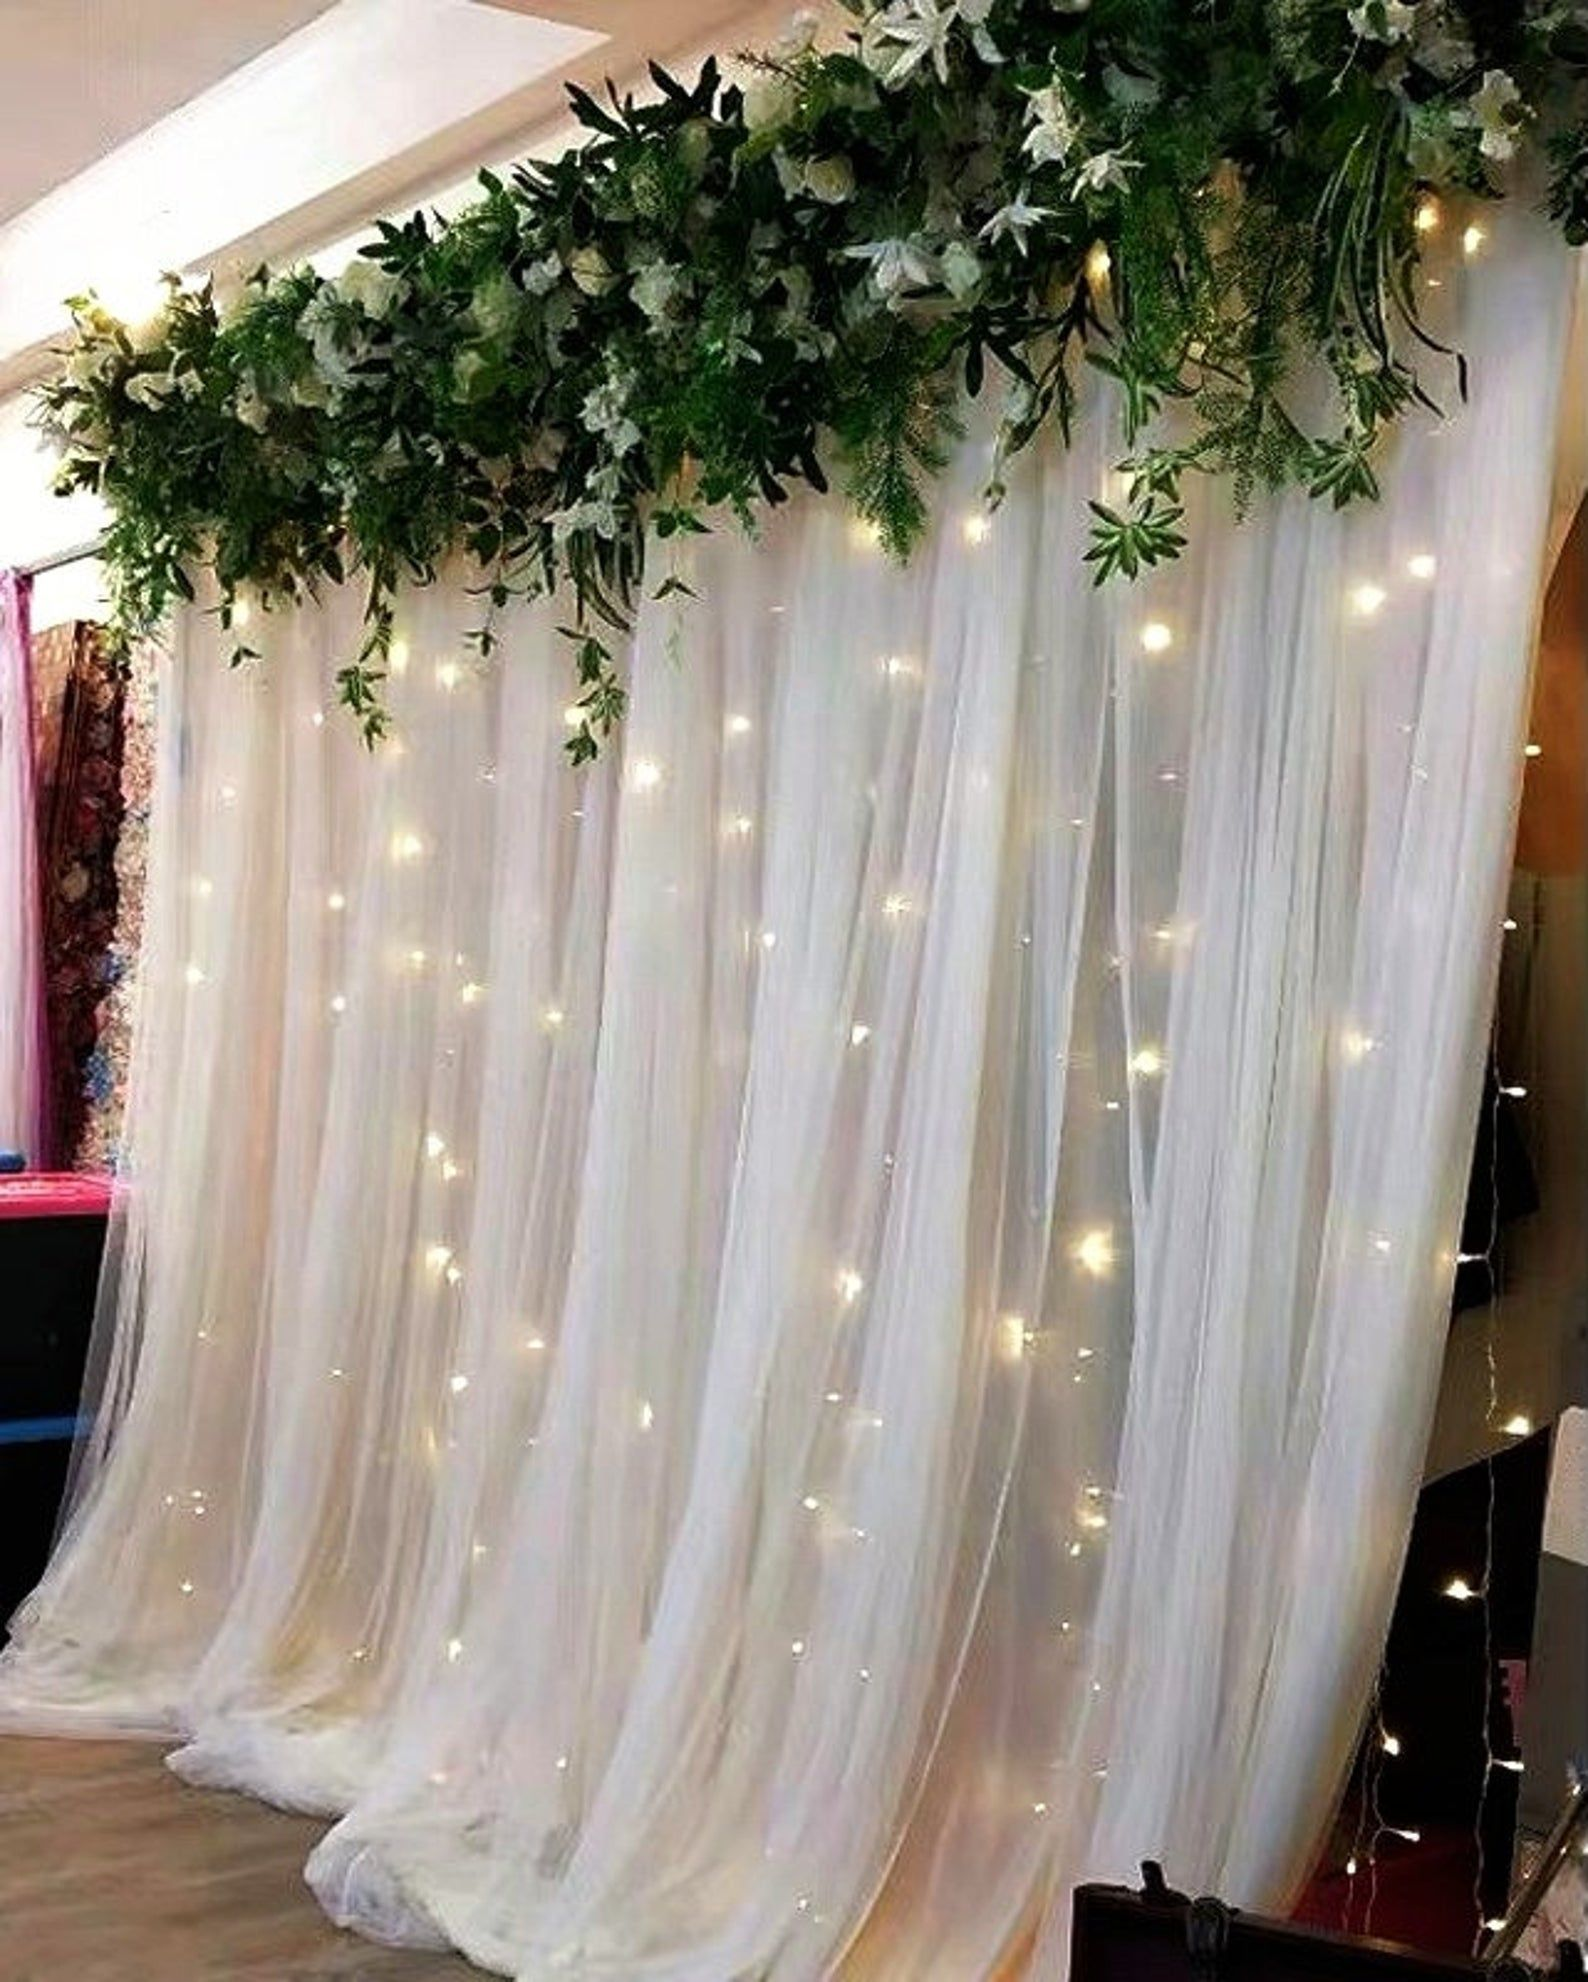 Wedding Backdrop Curtain Wedding Backdrop Fabric Tulle Etsy Wedding Reception Backdrop Tulle Backdrop Photo Backdrop Wedding